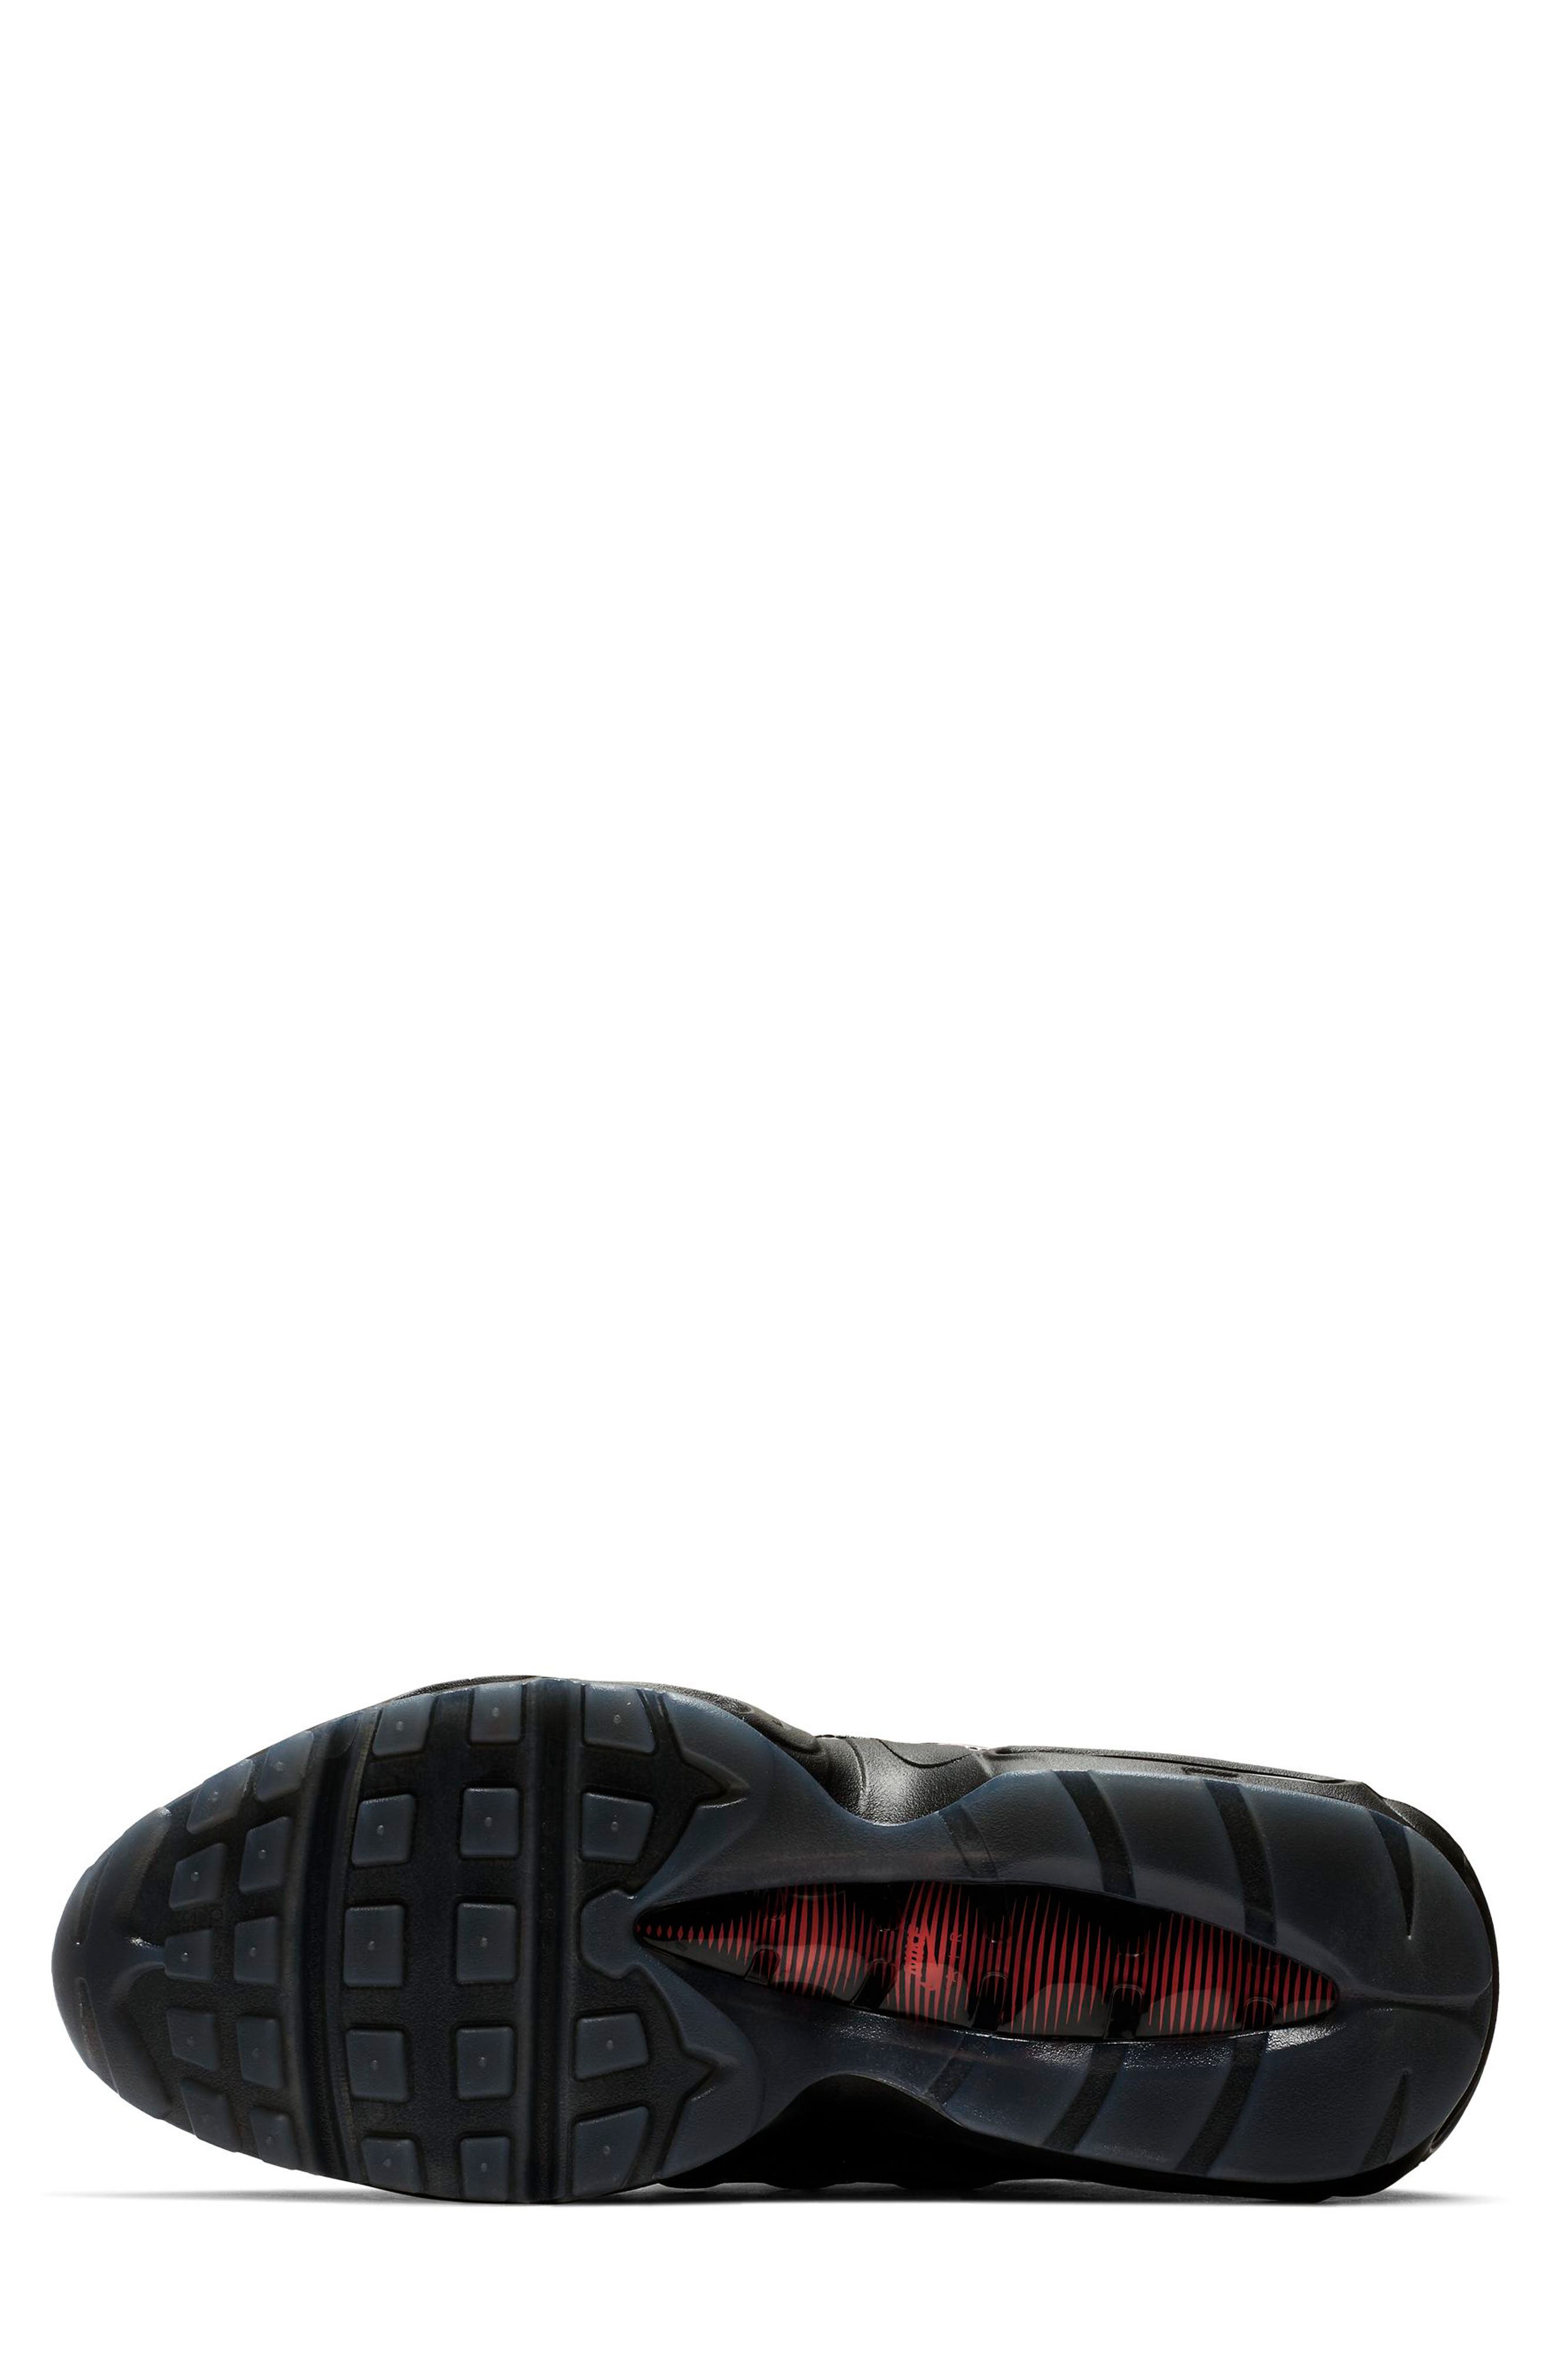 Air Max 95 LV8 Sneaker,                             Alternate thumbnail 5, color,                             001